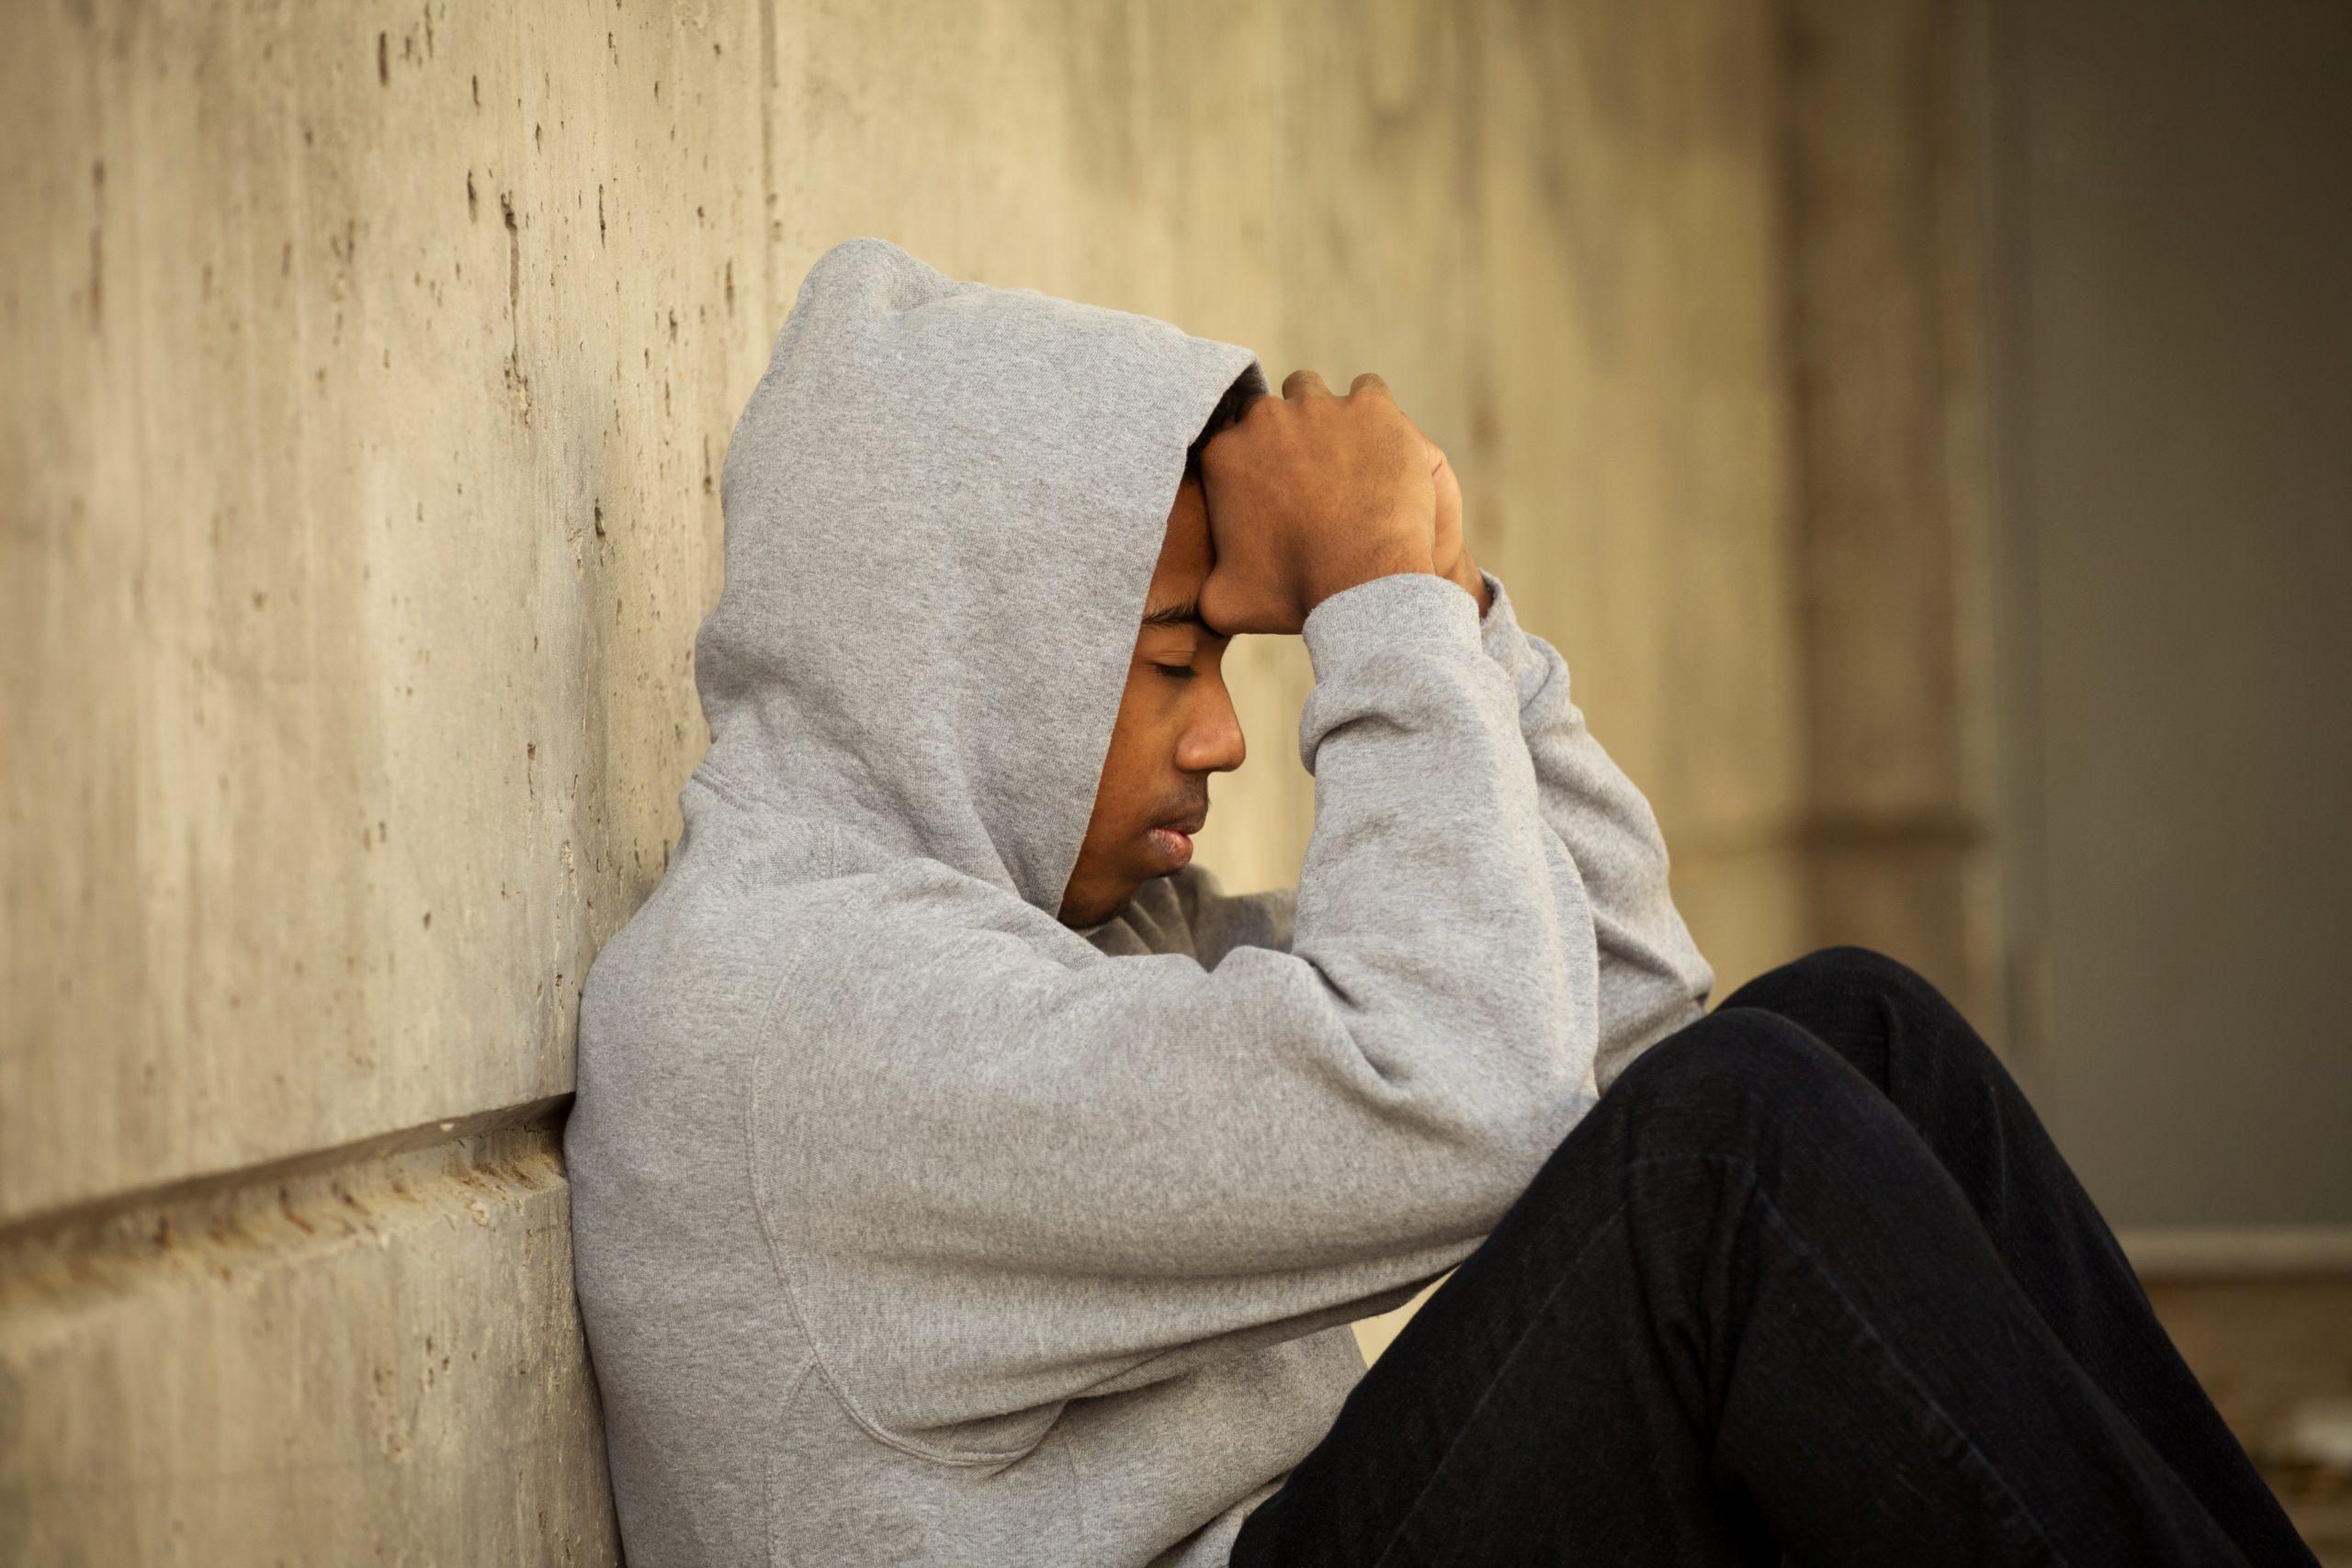 Man Sitting on Street Distressed